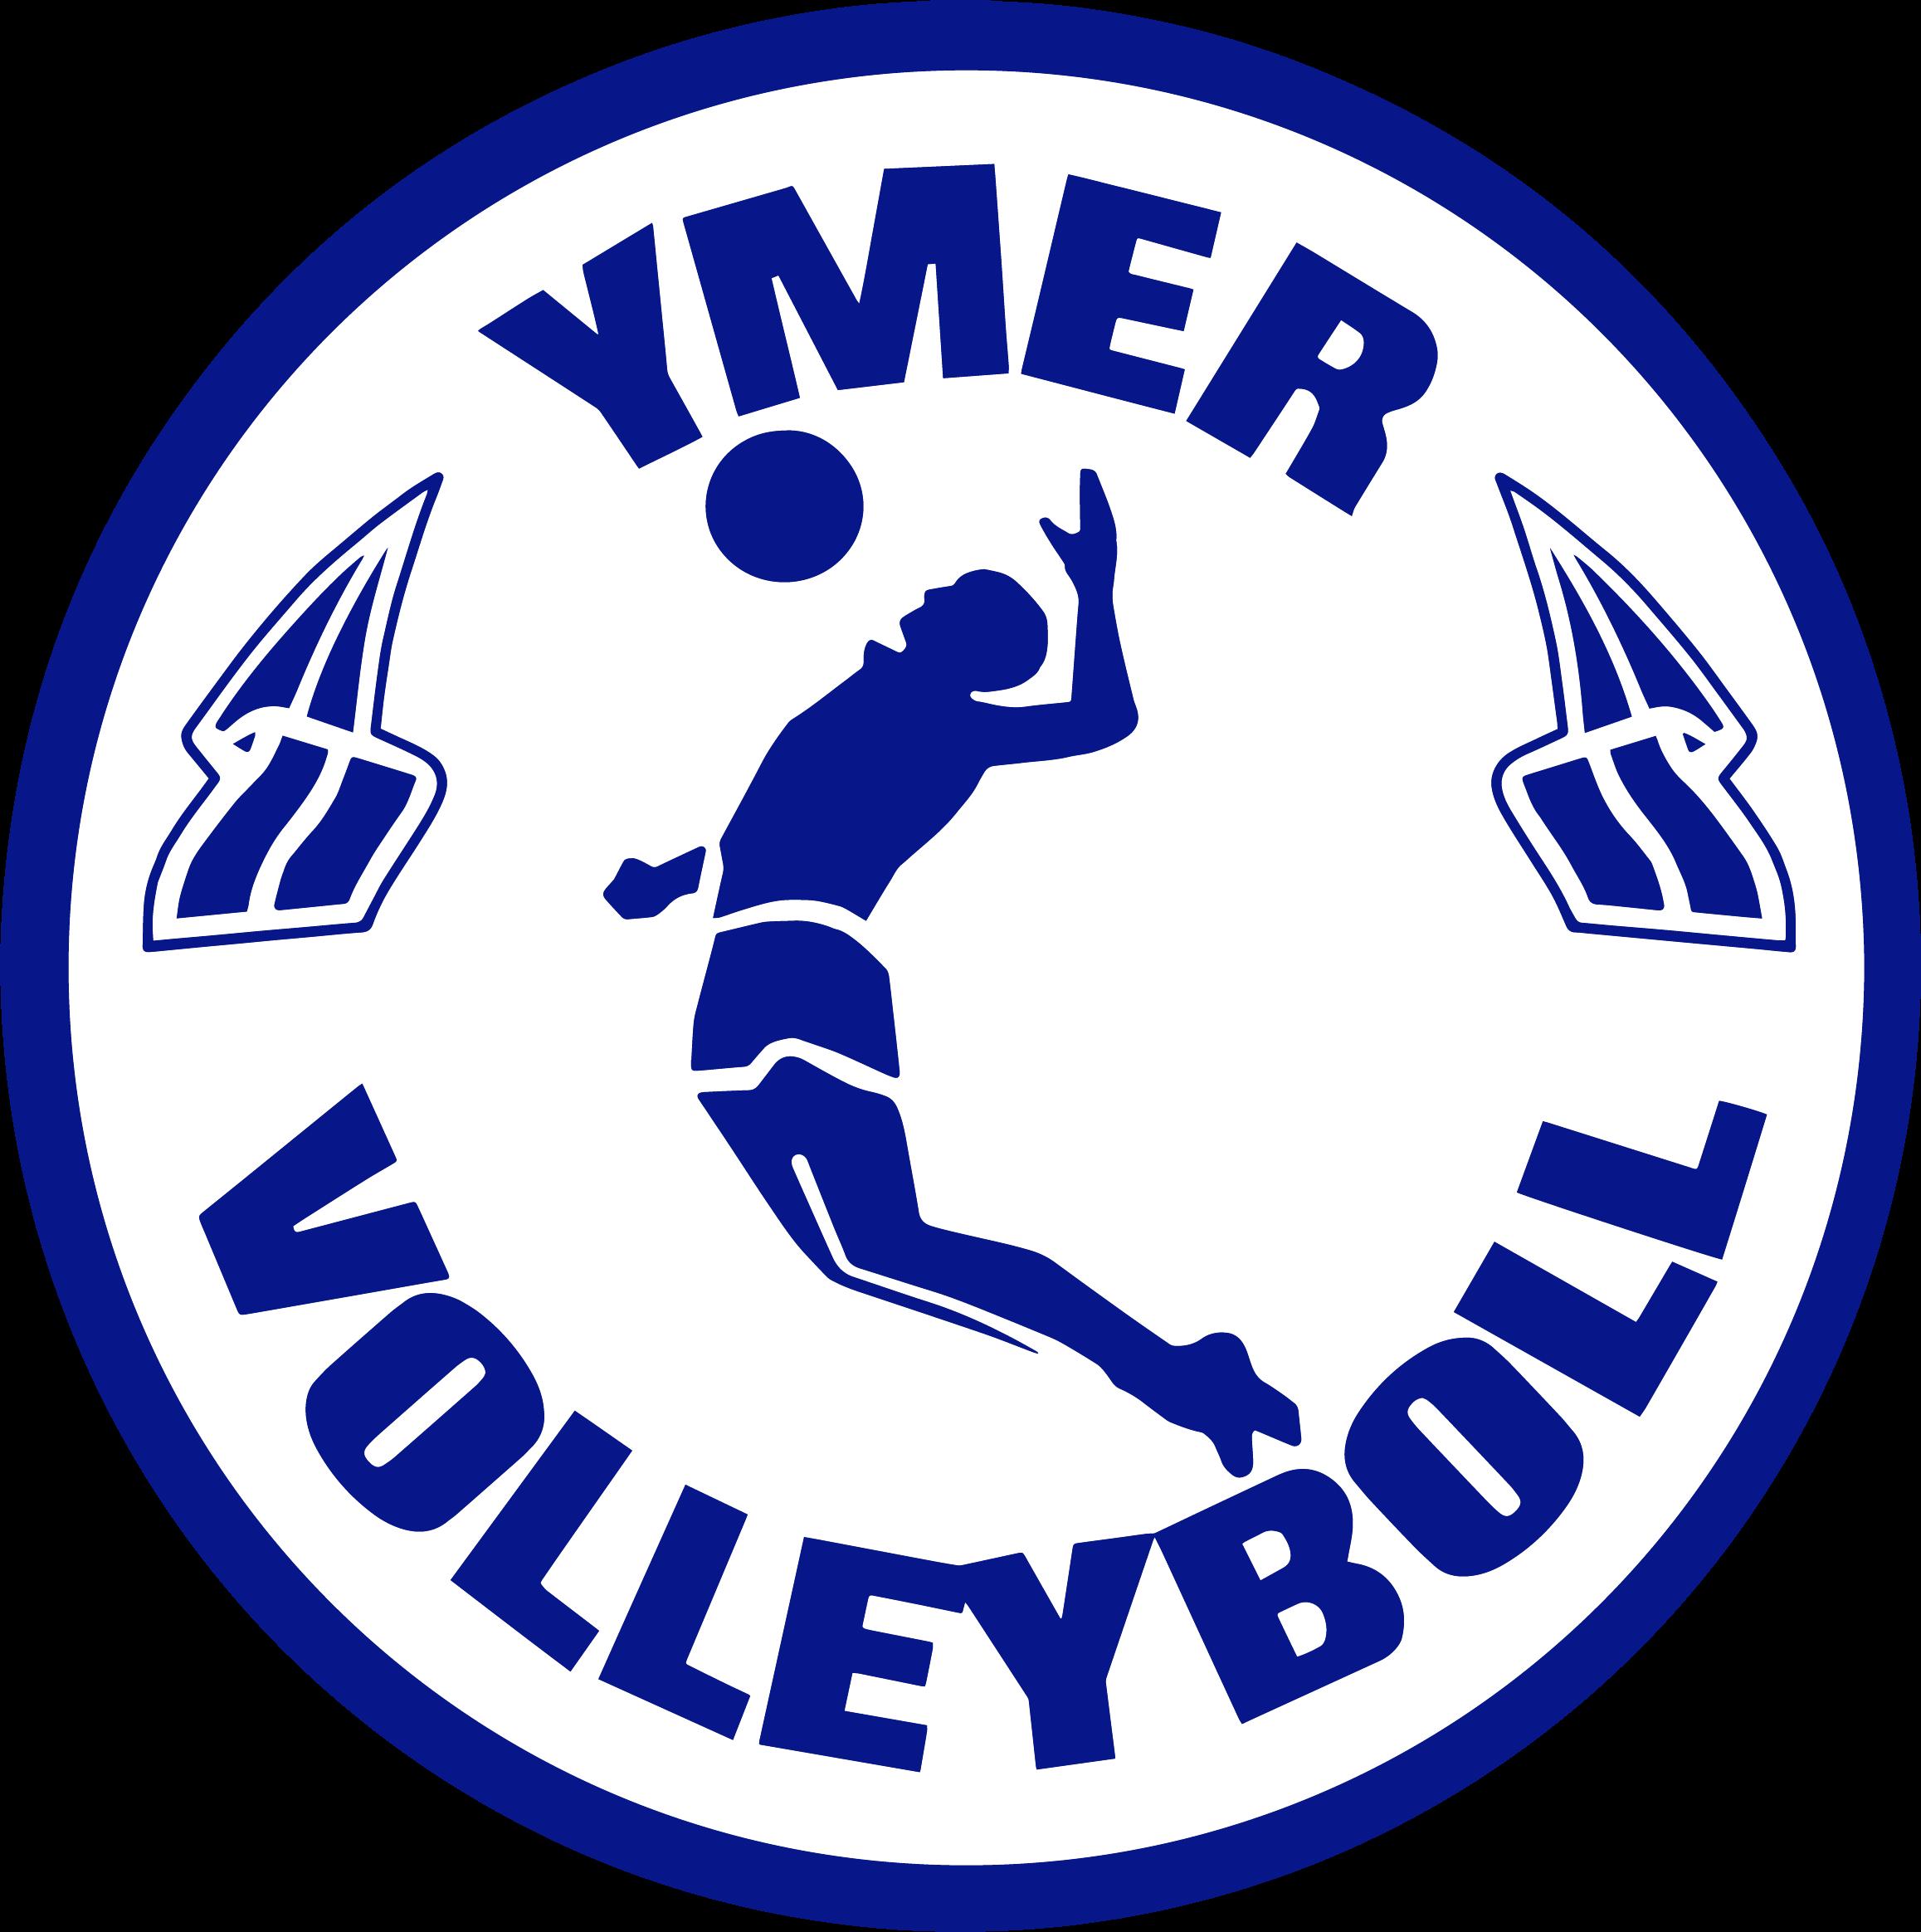 IK Ymer Volleyboll